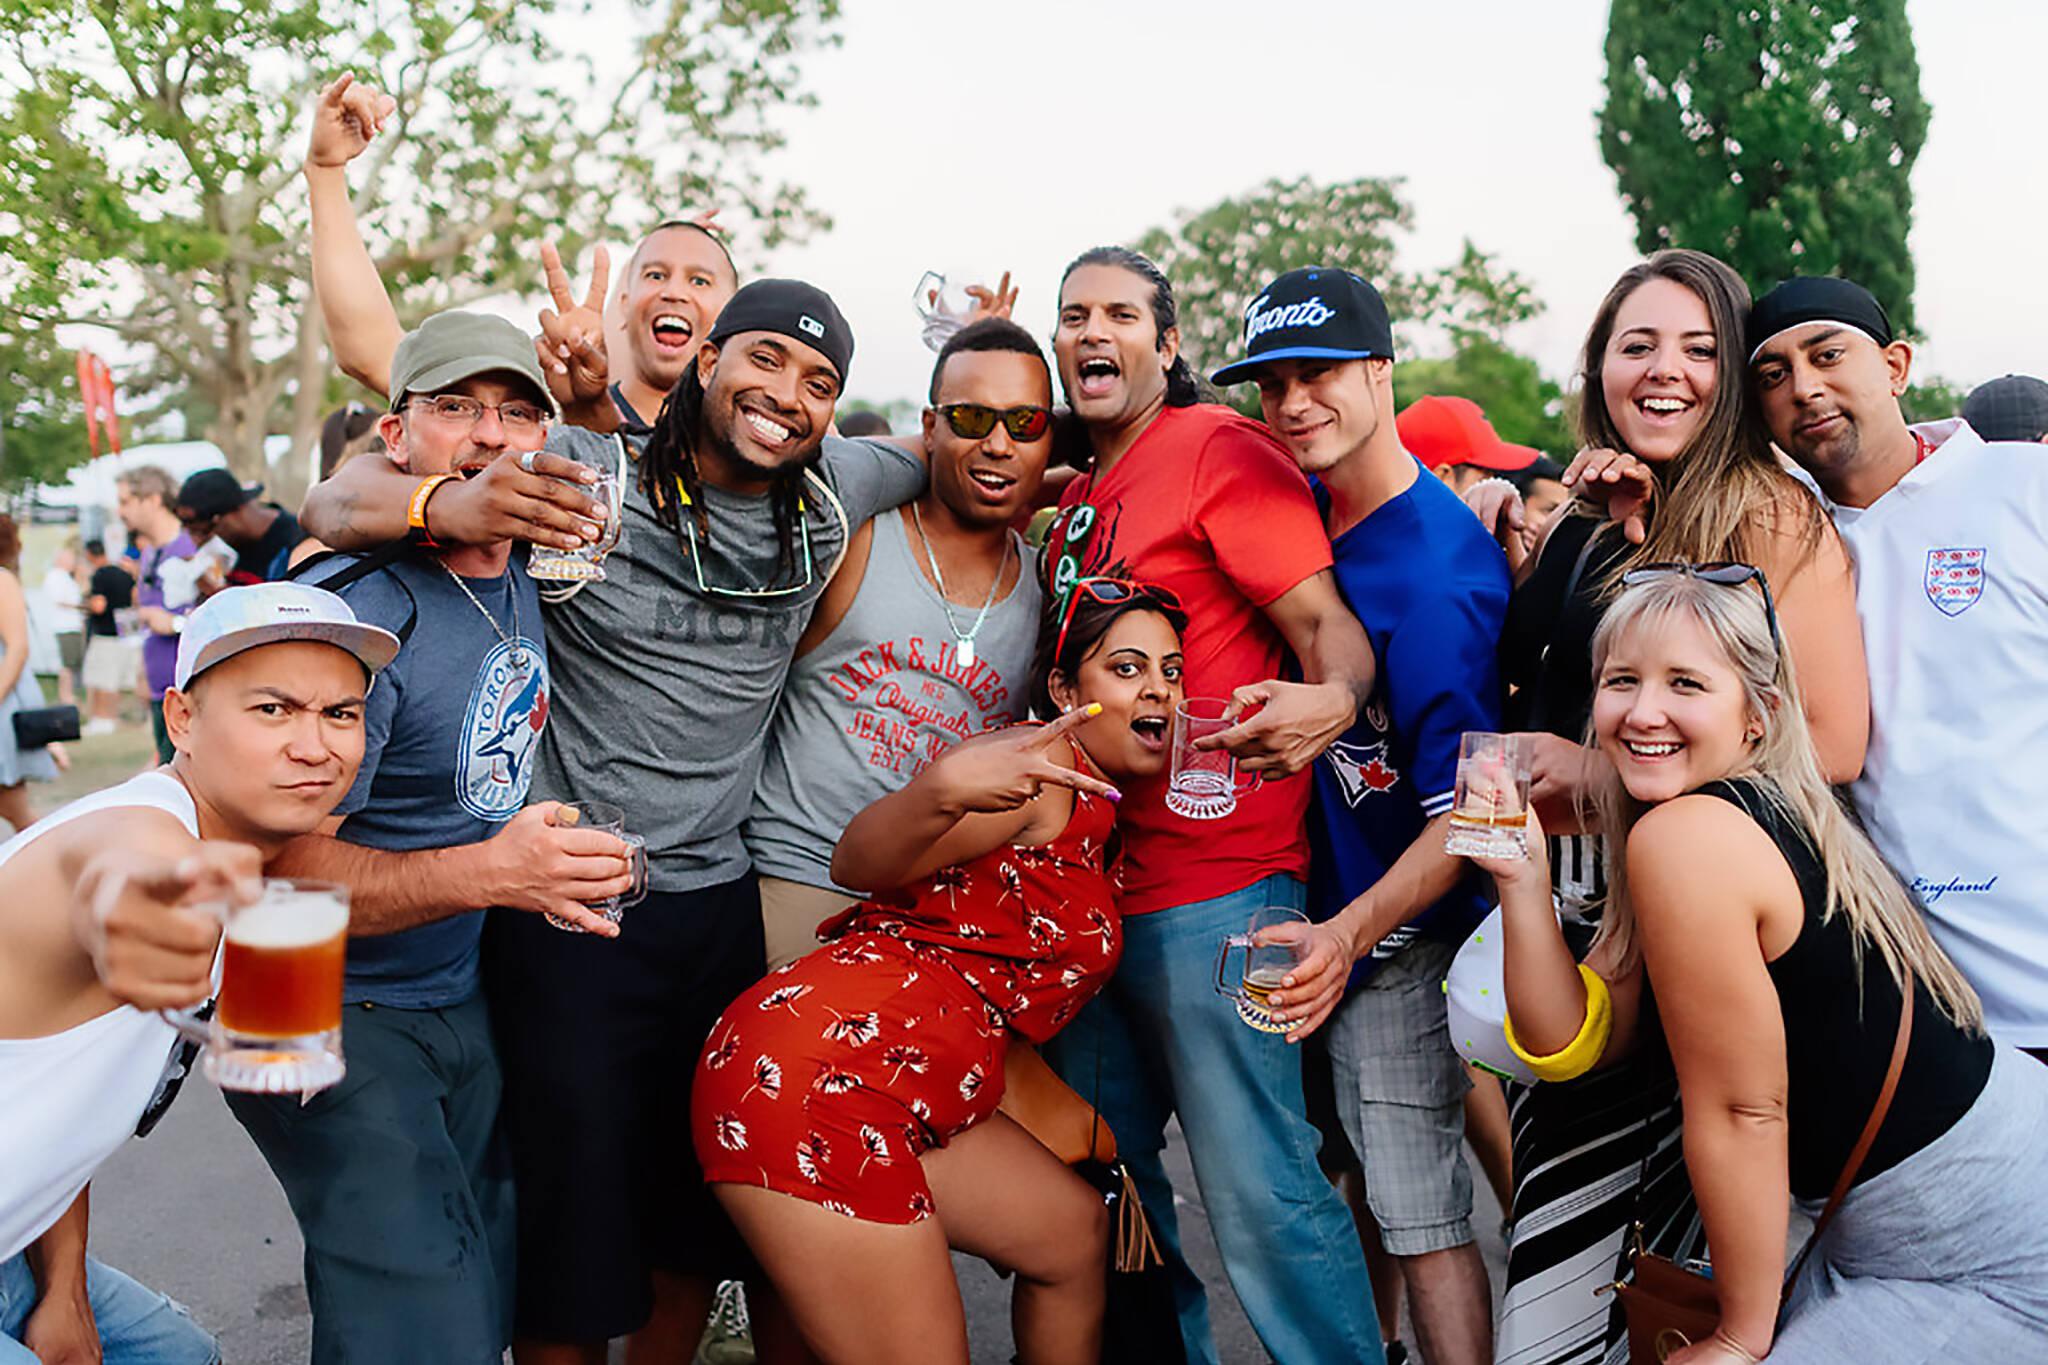 Toronto Beer Festival